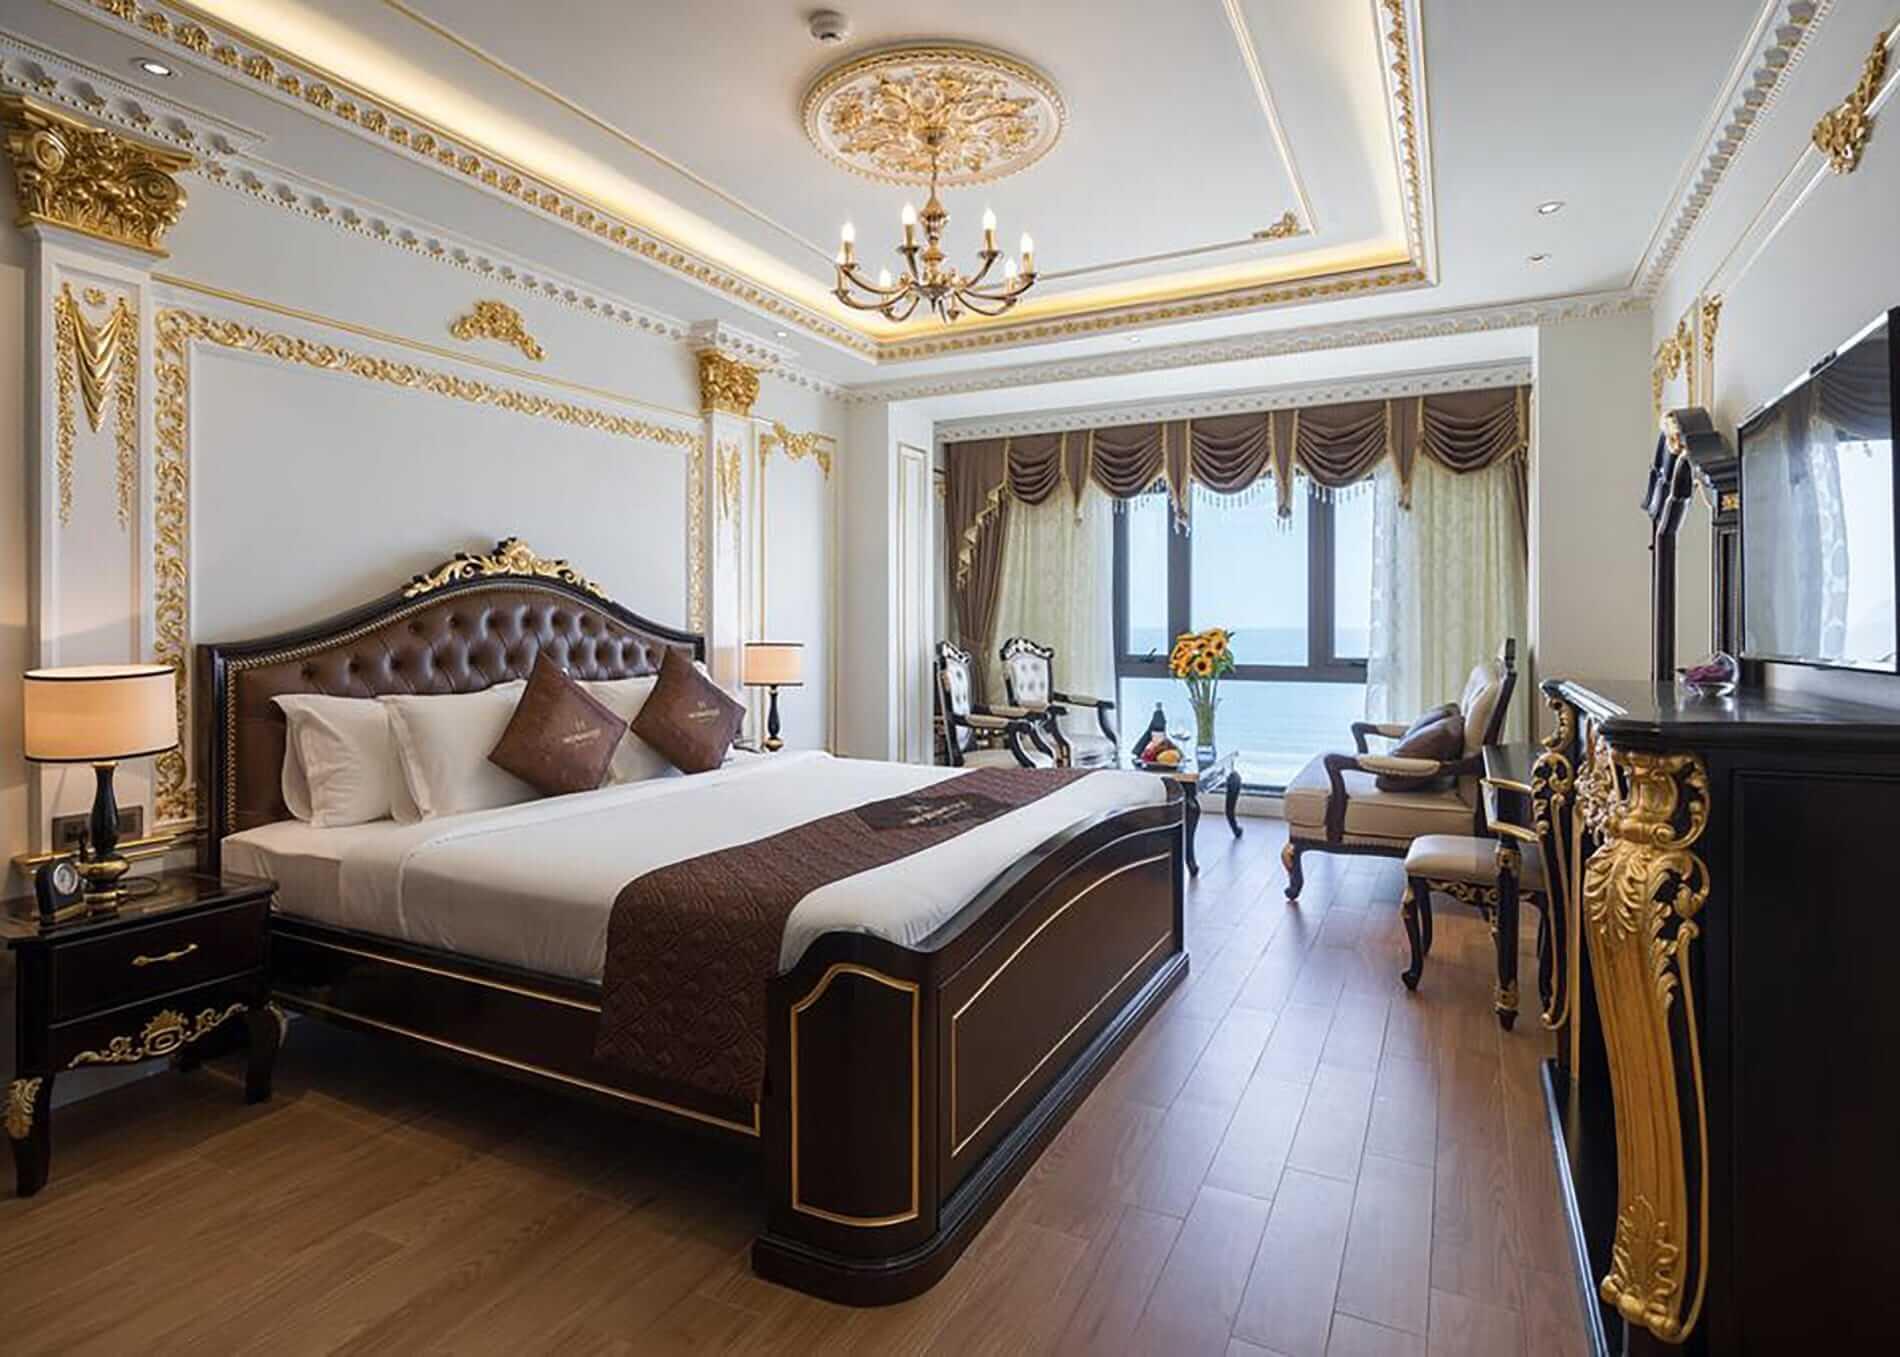 luxurious King room at Monarque Hotel Da Nang